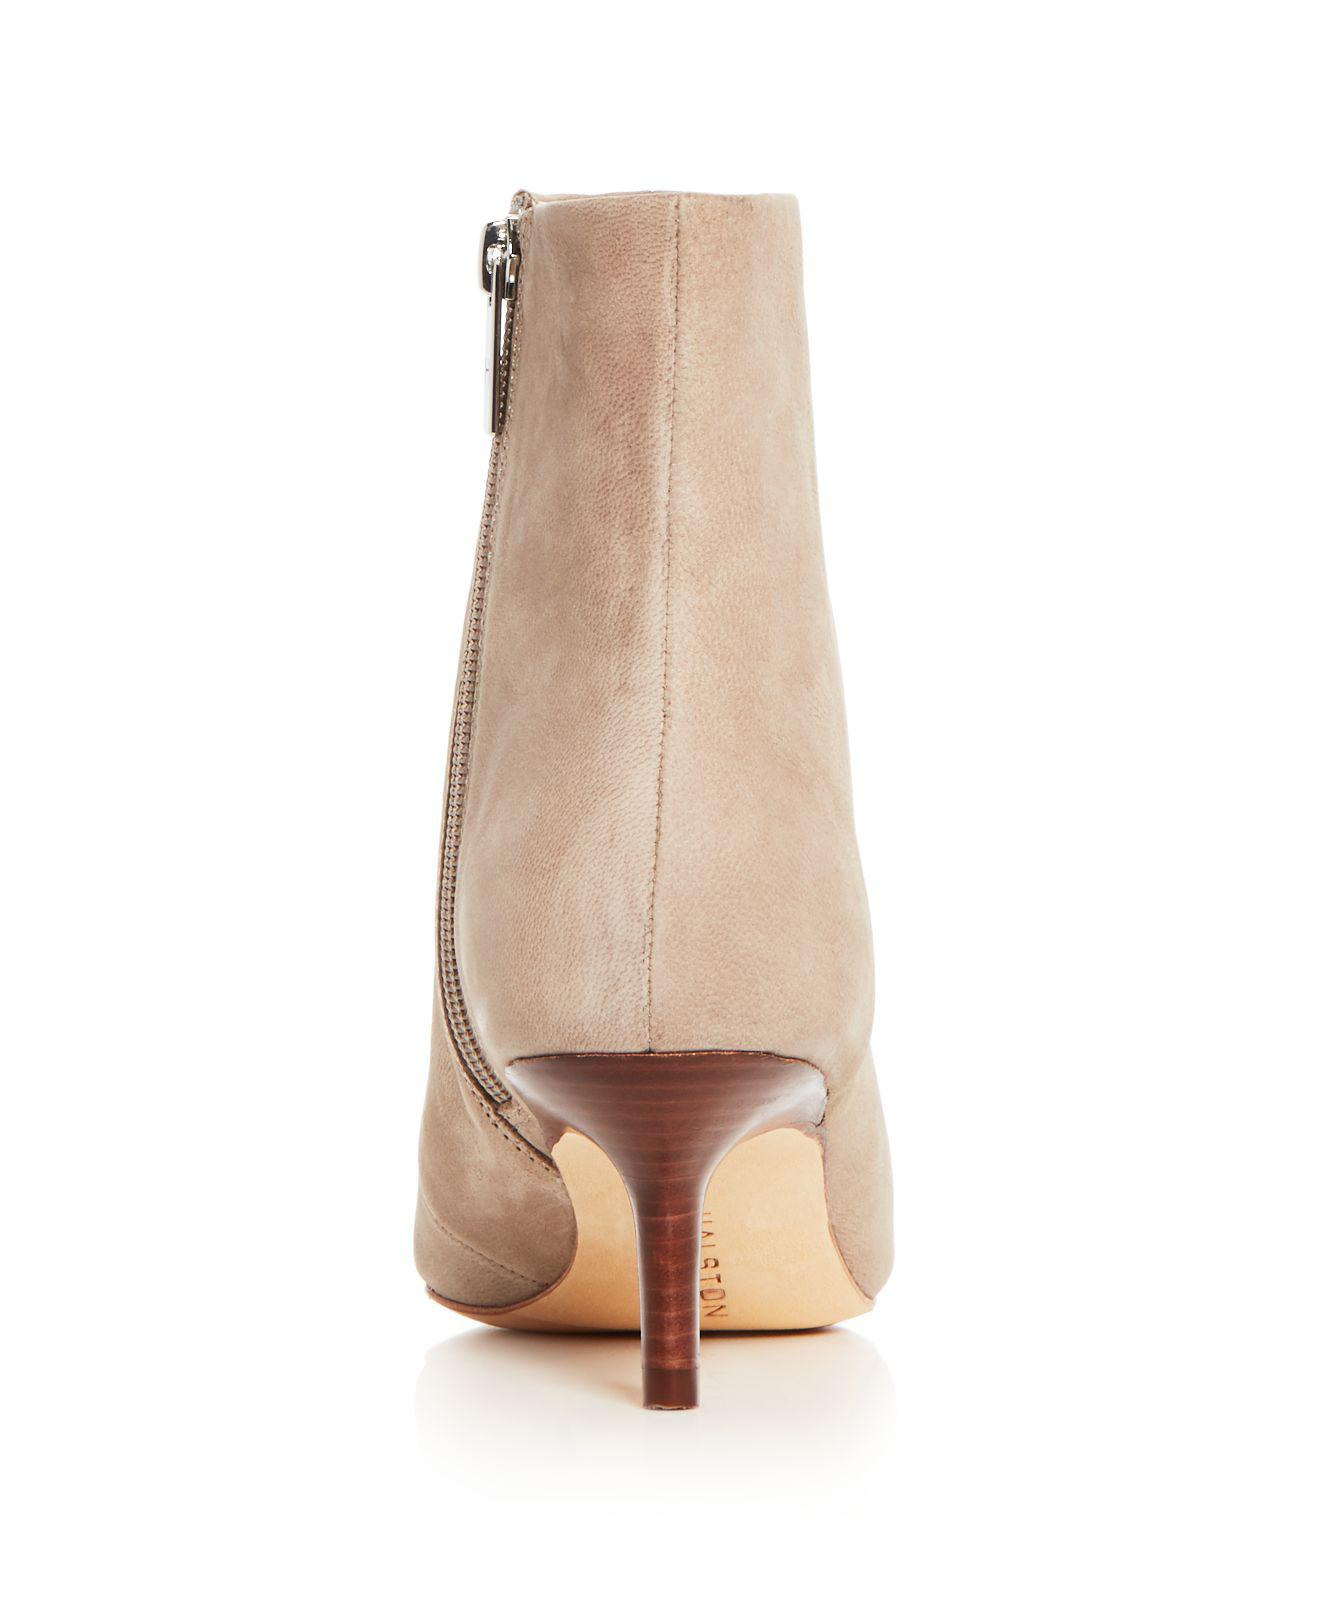 Halston Heritage Women's Faith Nubuck Leather Kitten Heel Booties For Sale Cheap Online OqvYOcD